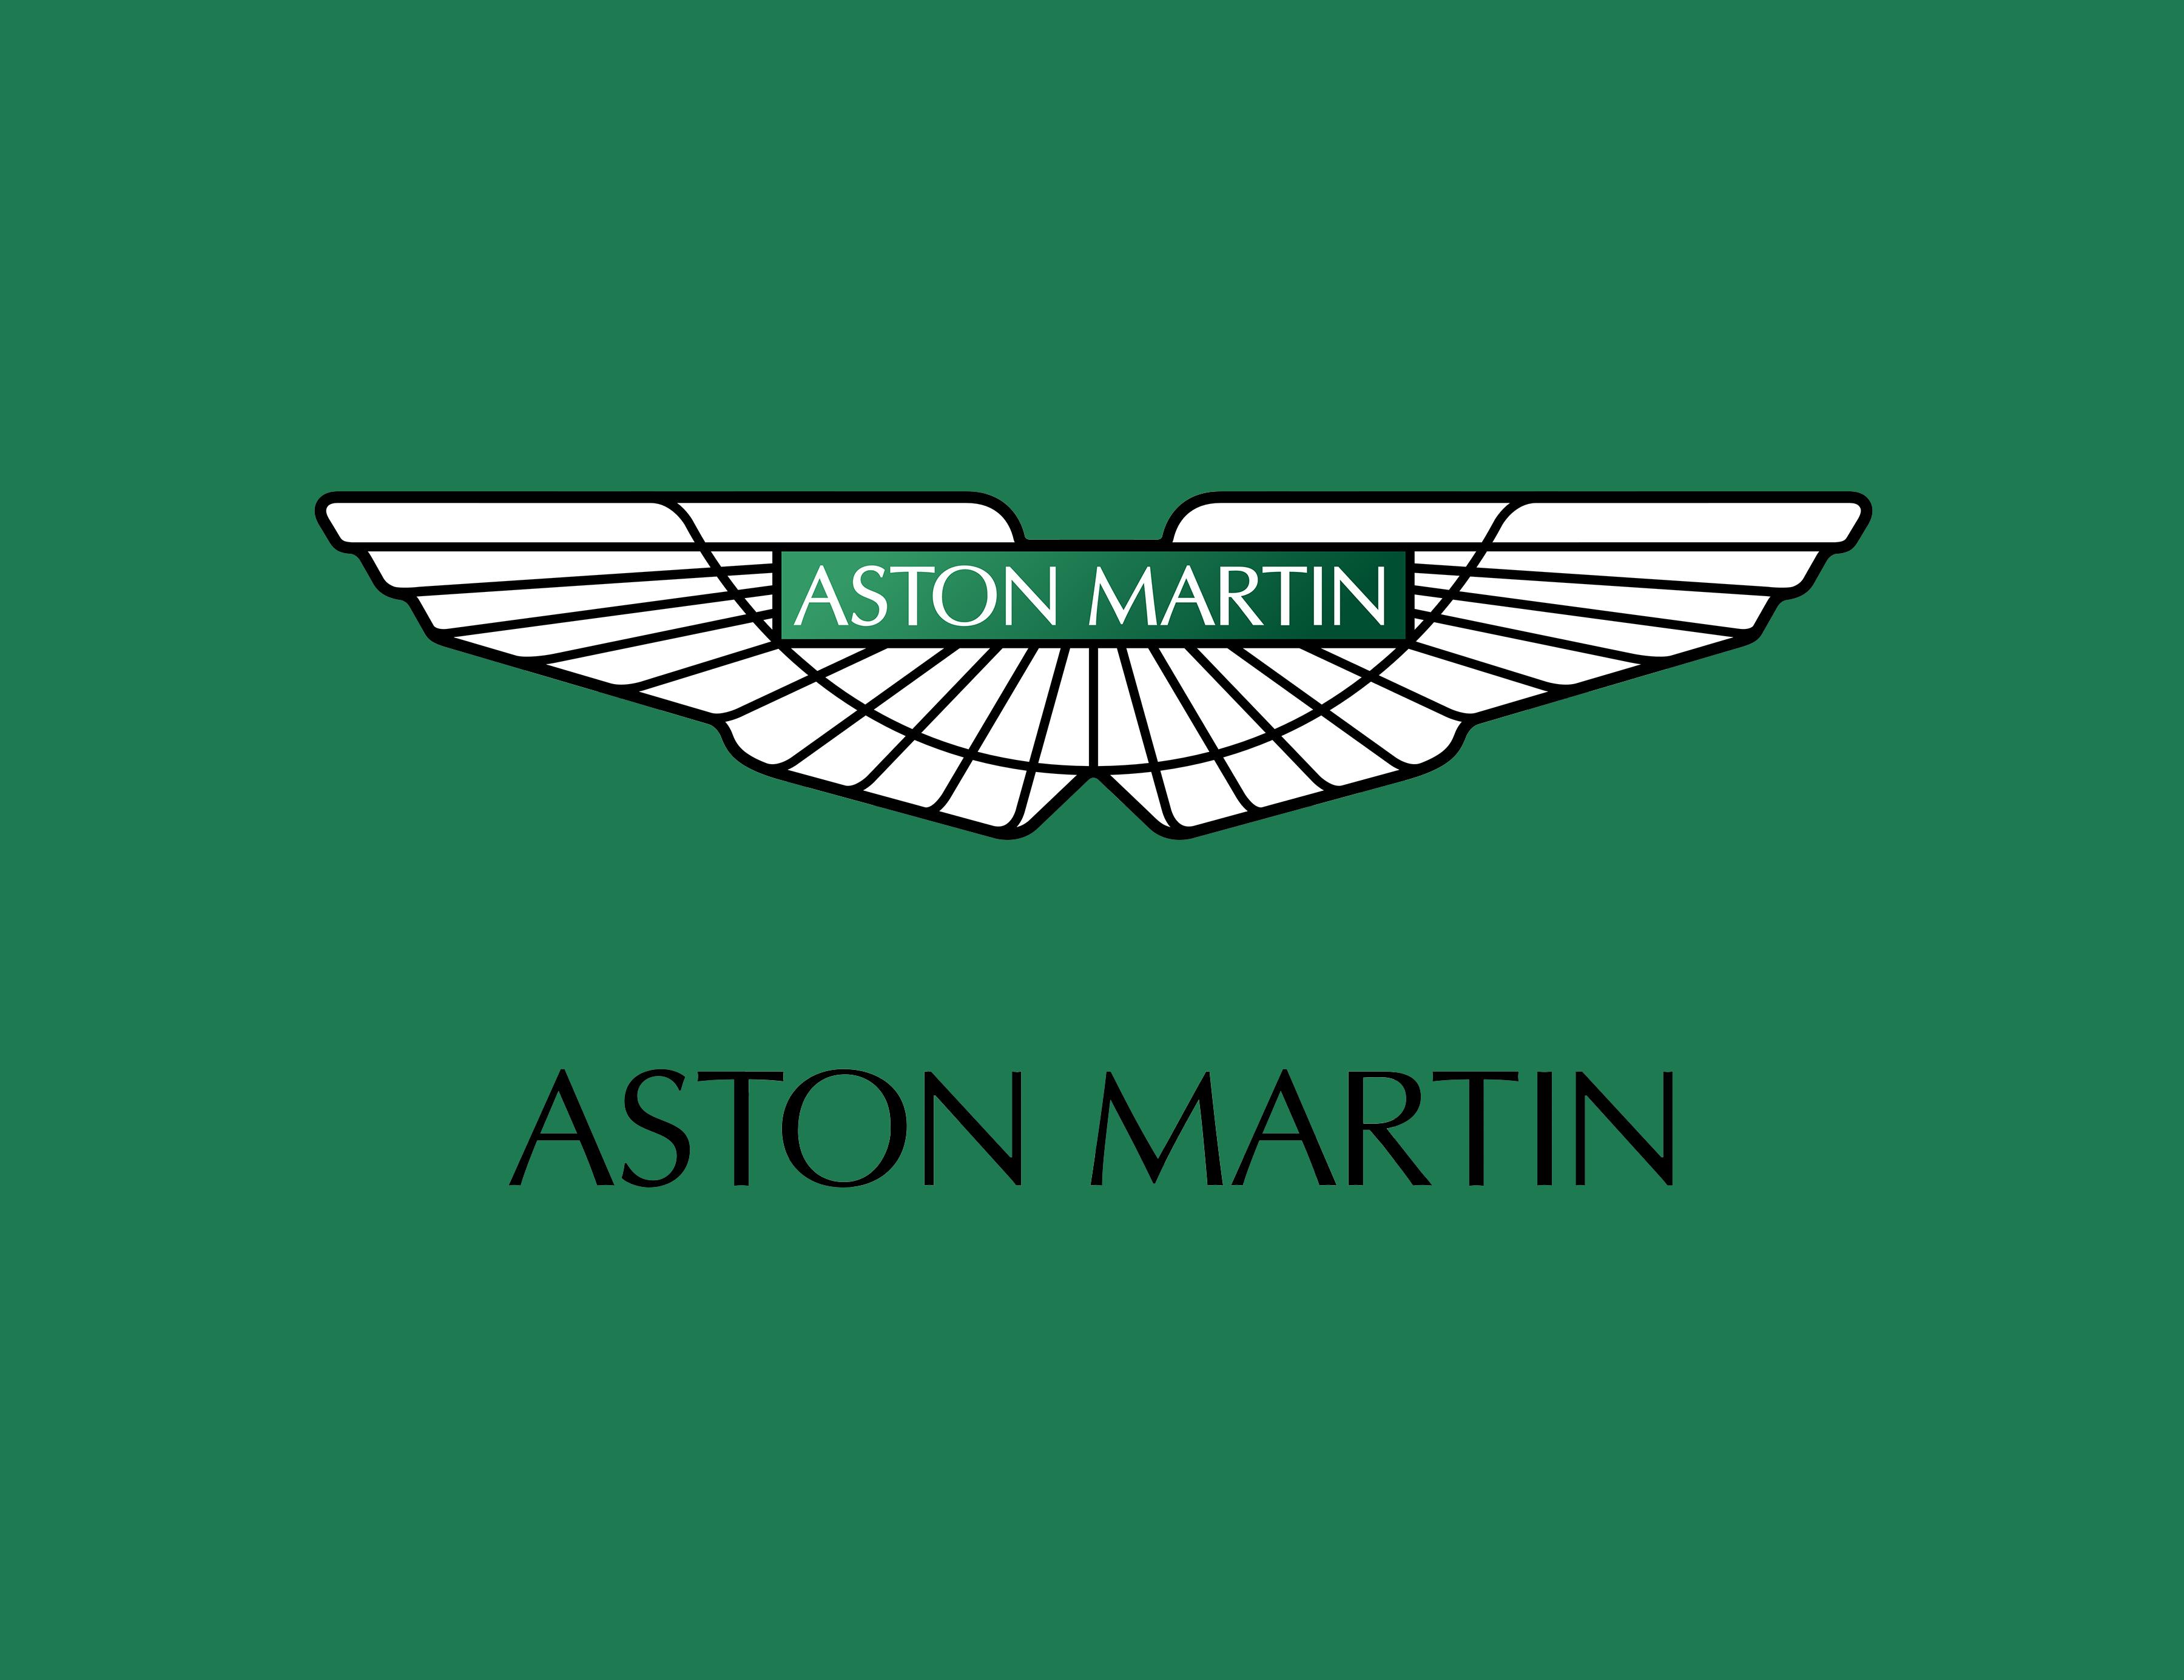 Aston Martin Logo Logojoy - Aston martin logo